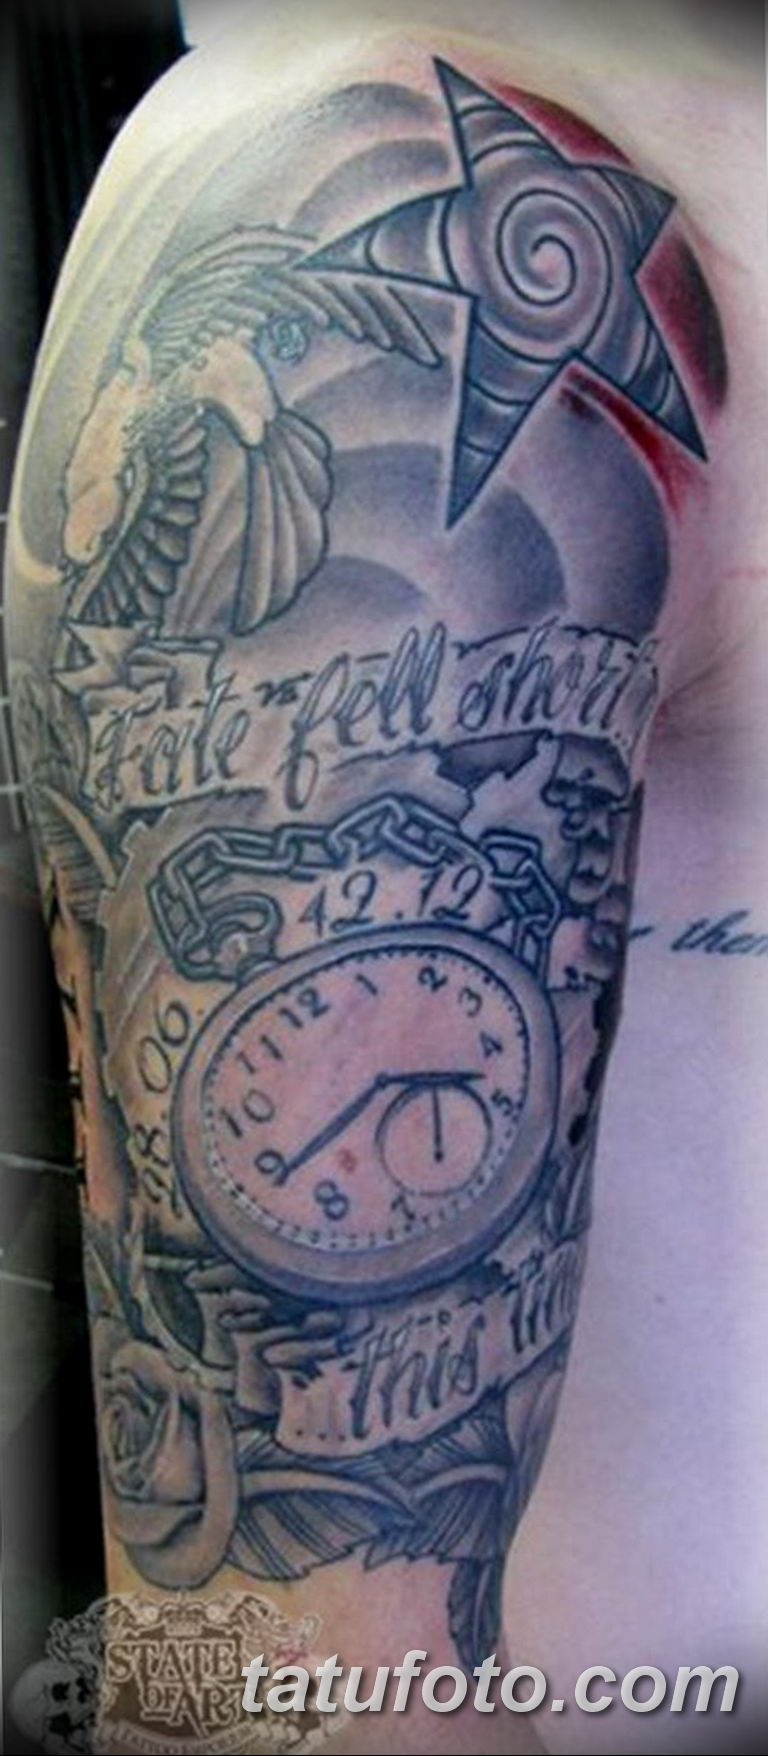 Фото ттату время (часы) 16.04.2019 №495 - tattoo time (hours) - tatufoto.com